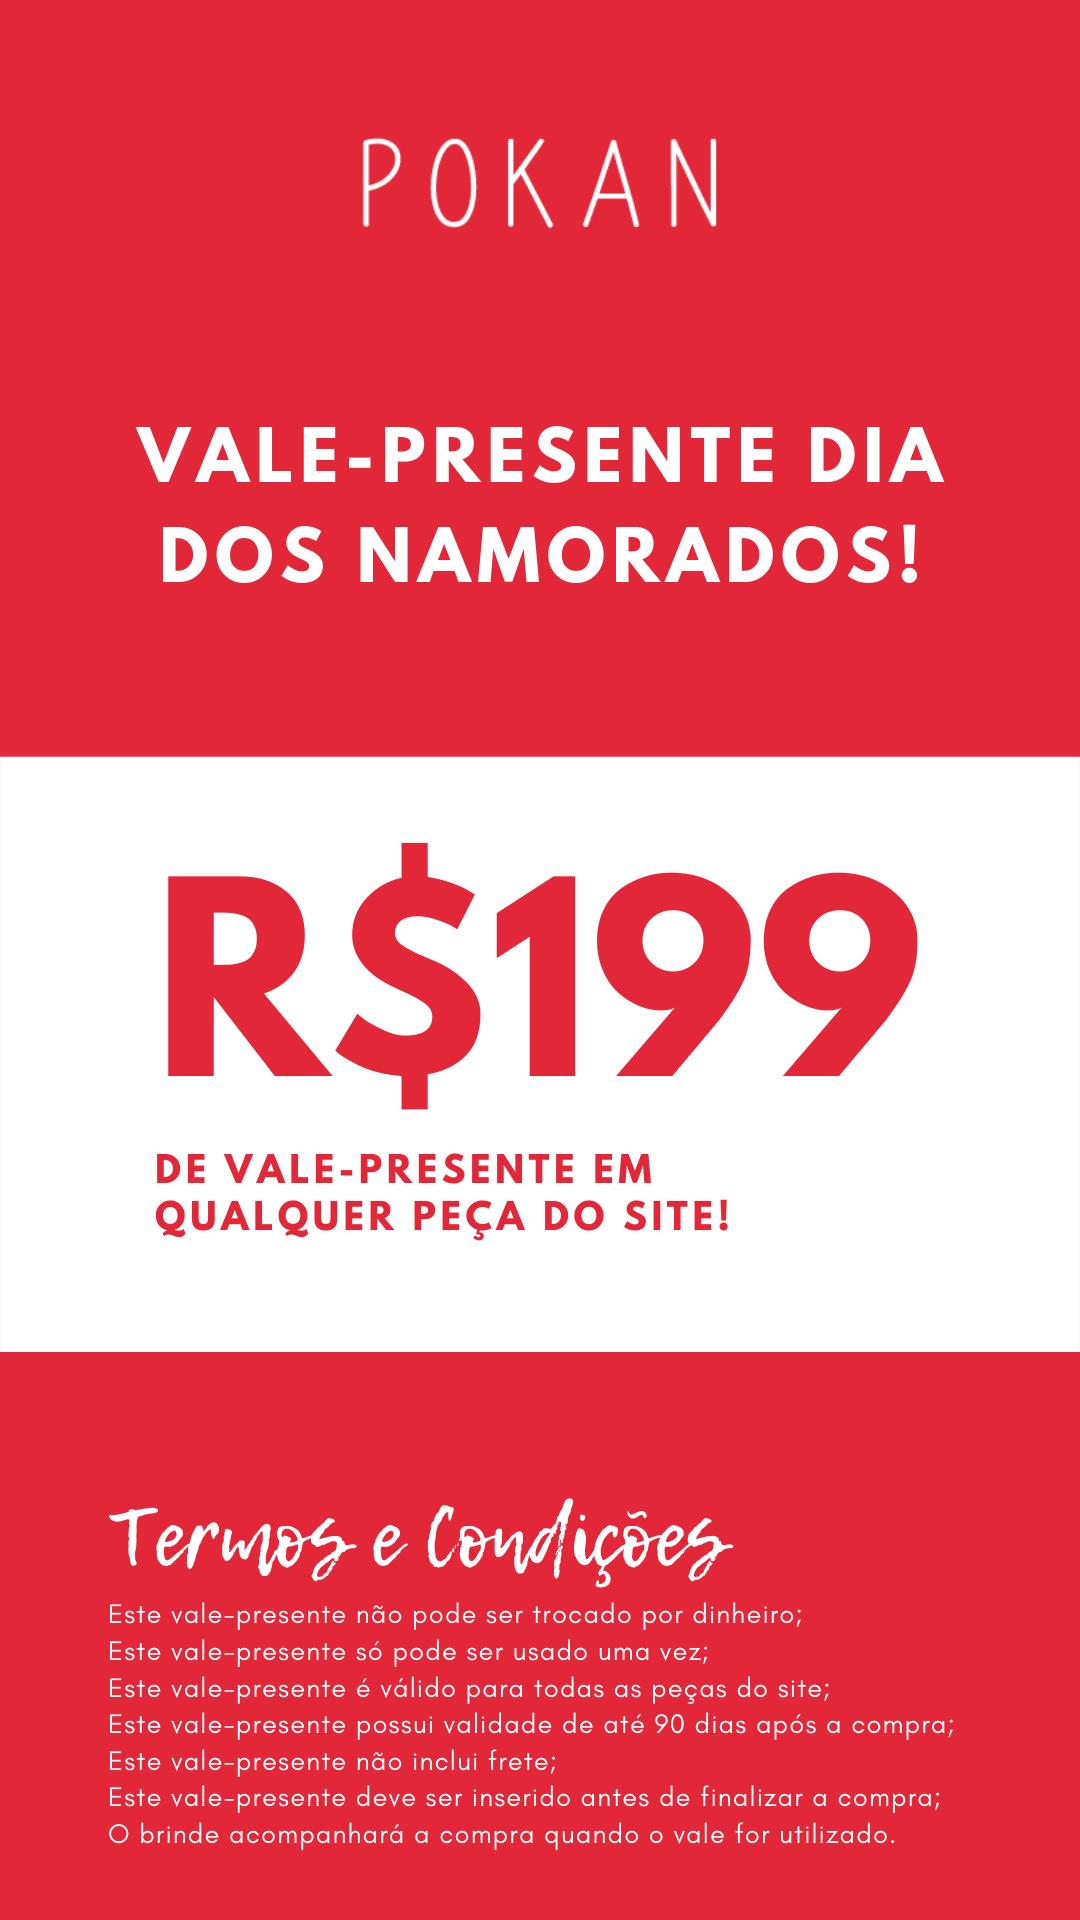 Vale Presente - R$199,00